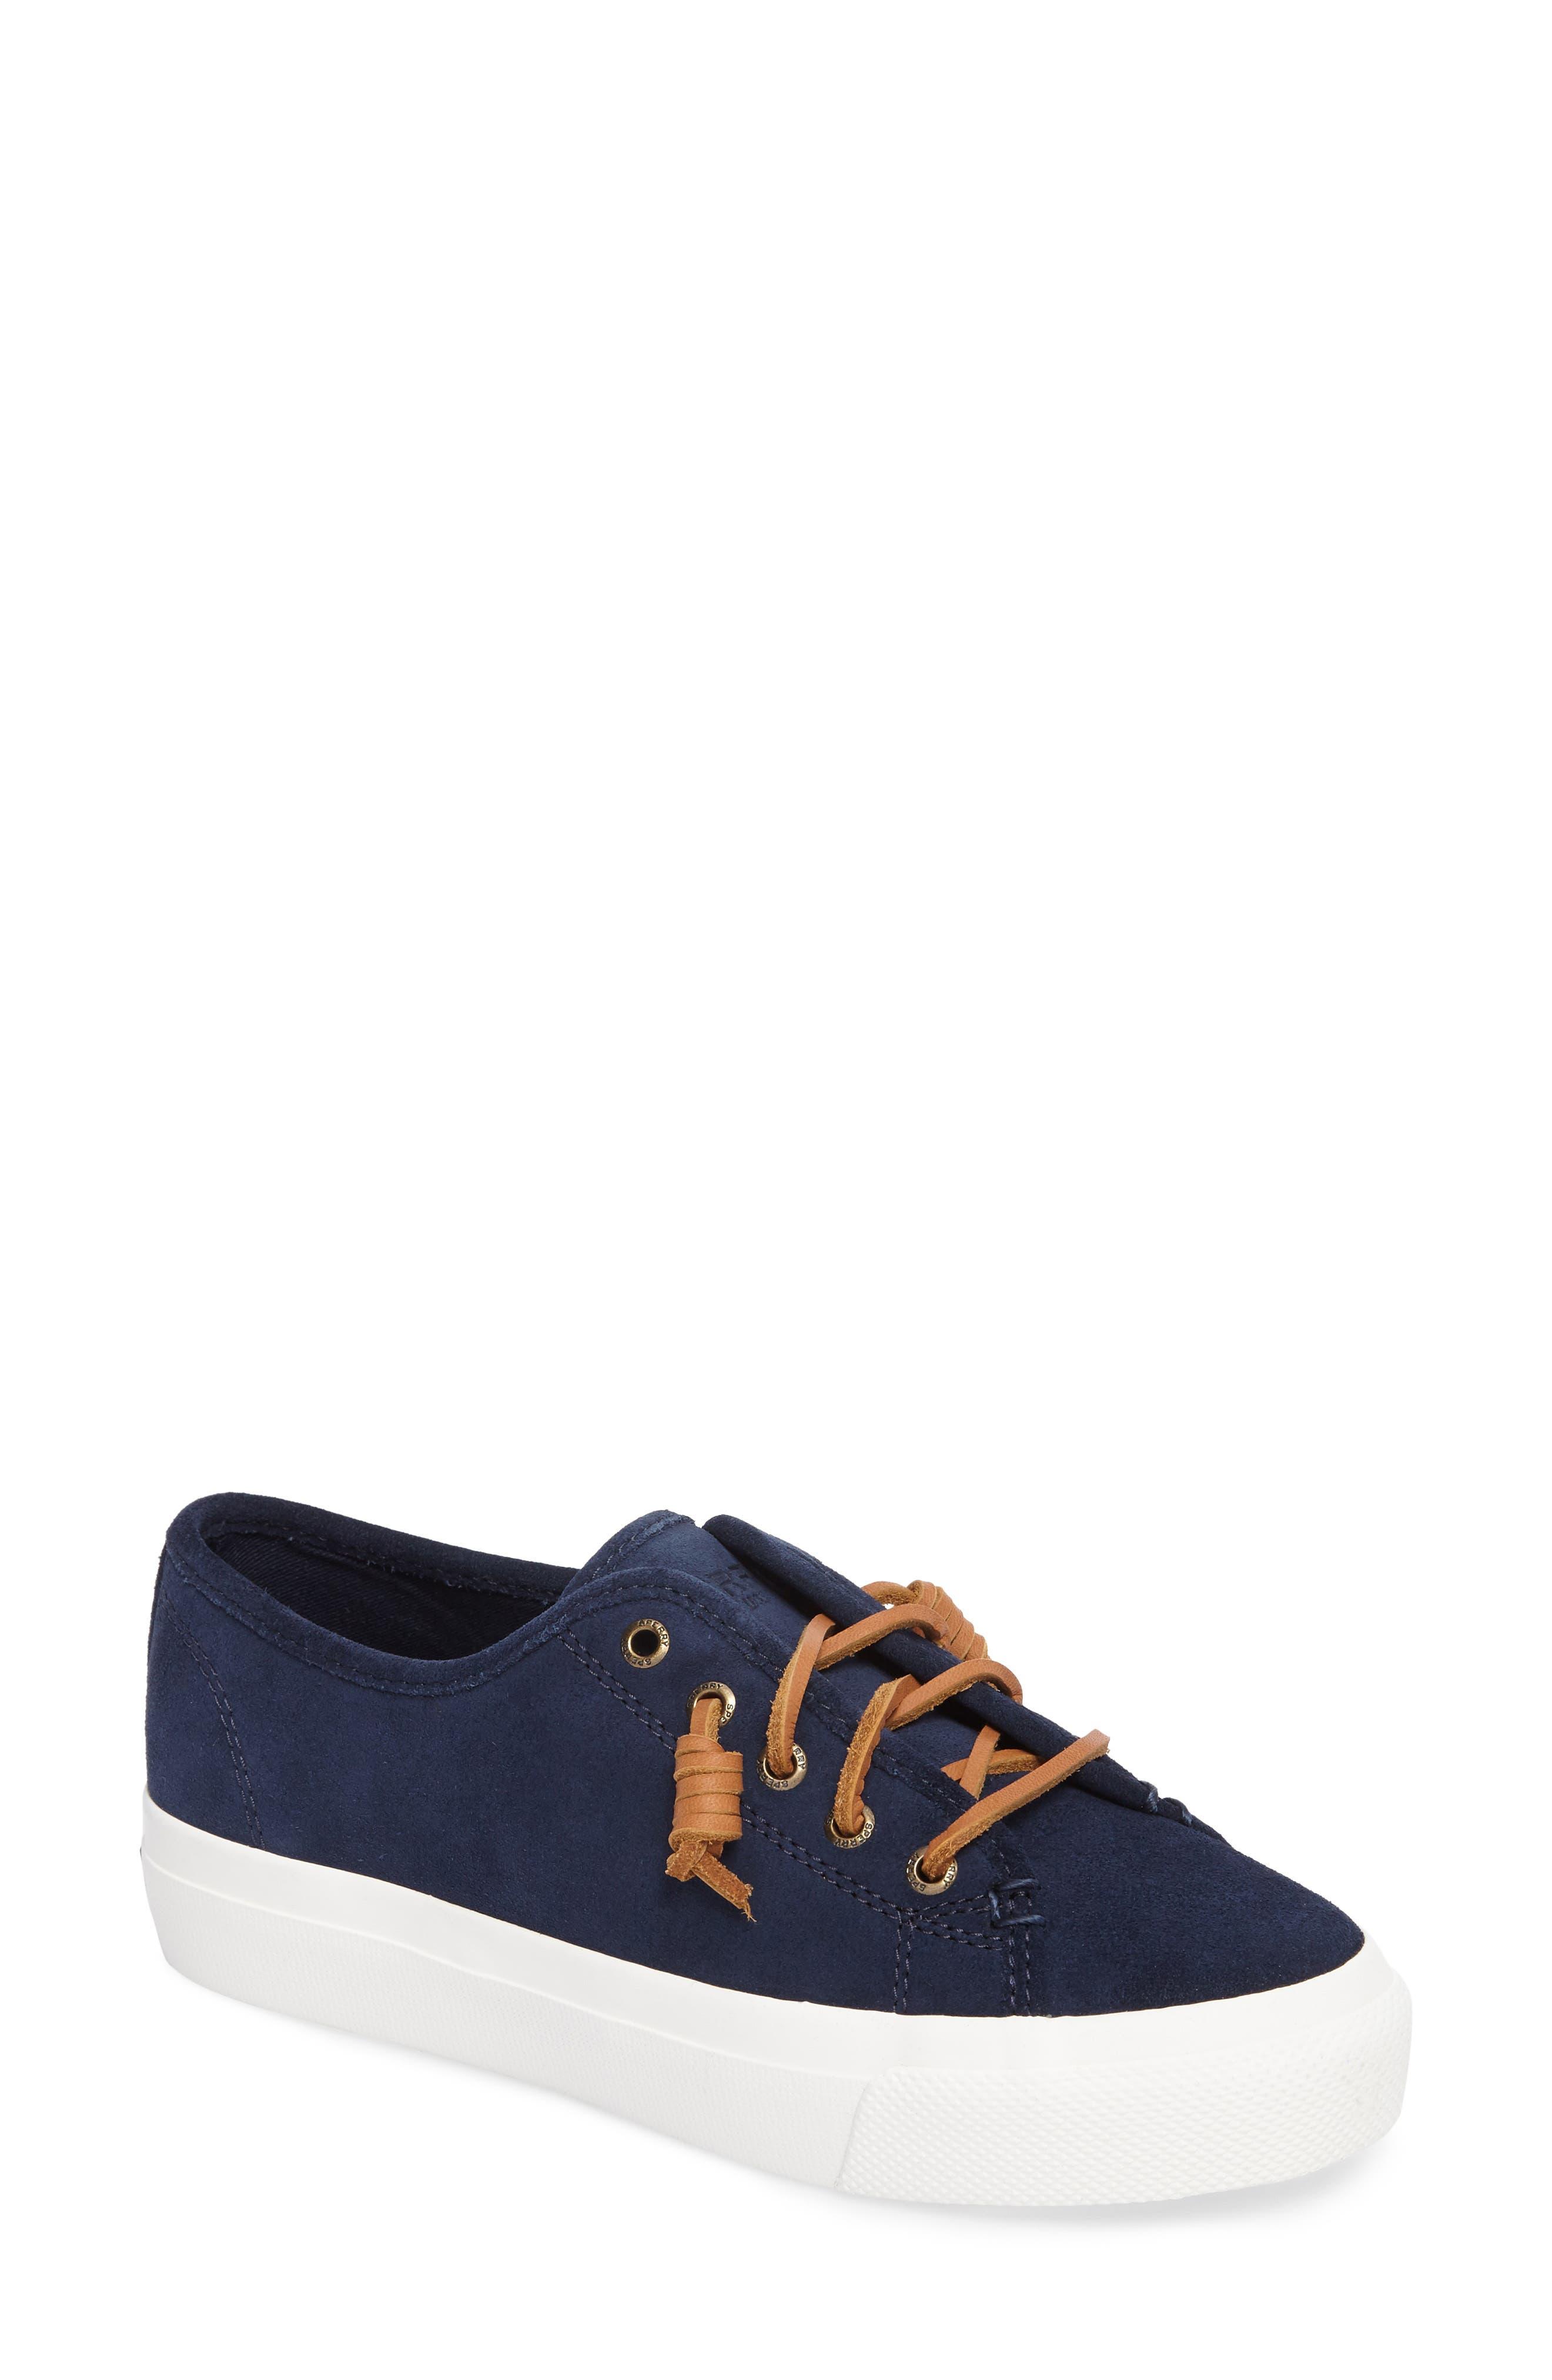 Sky Sail Platform Sneaker,                             Main thumbnail 1, color,                             410